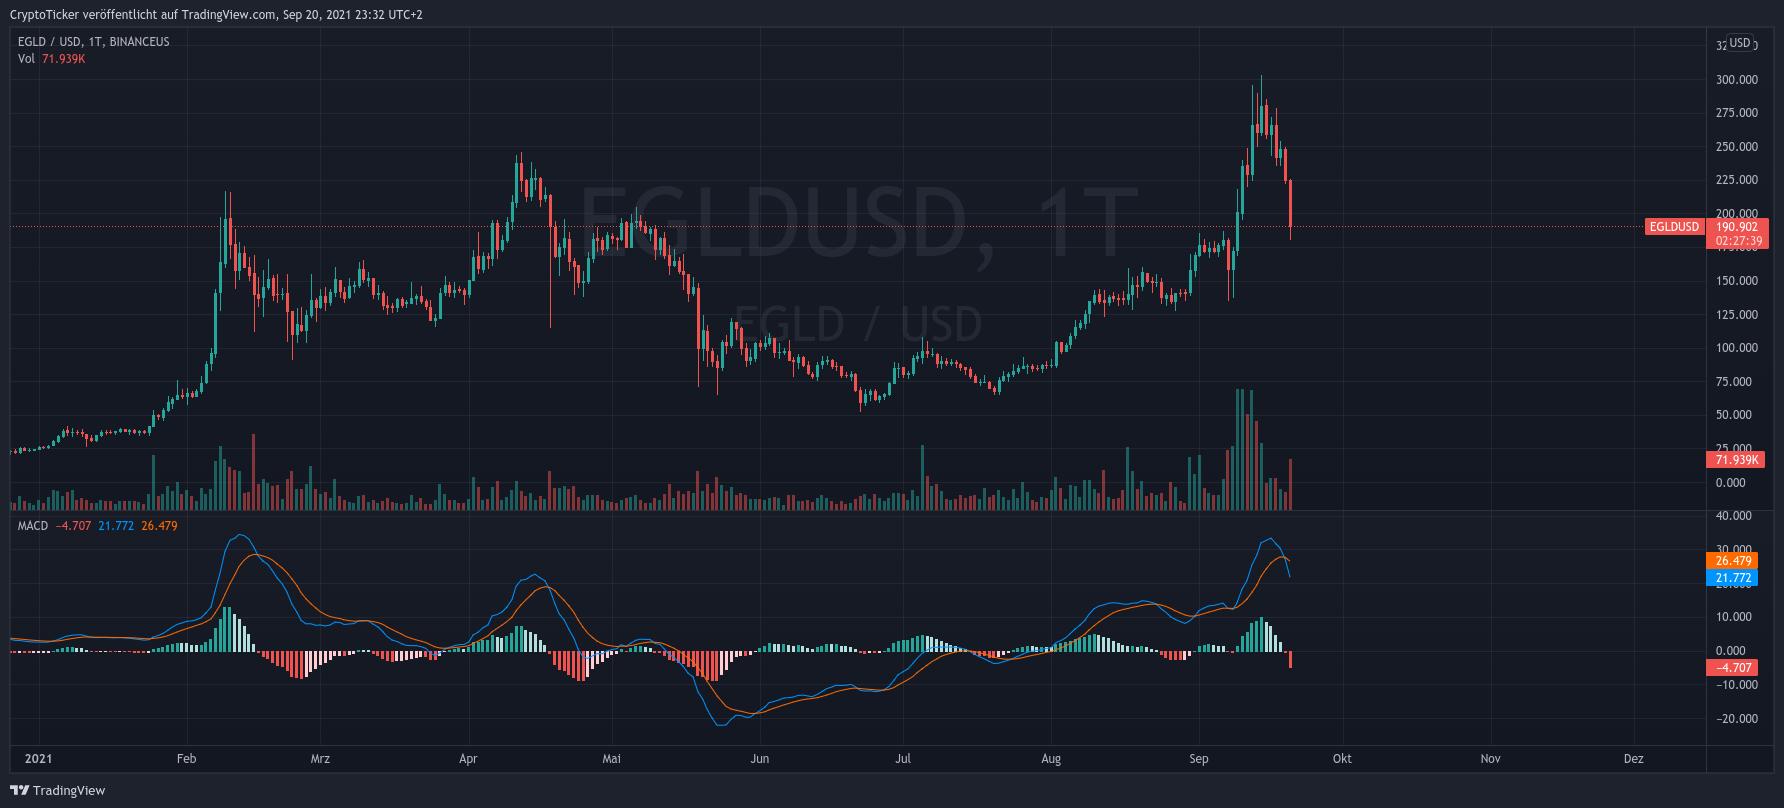 Elrond crypto chart on TradingView